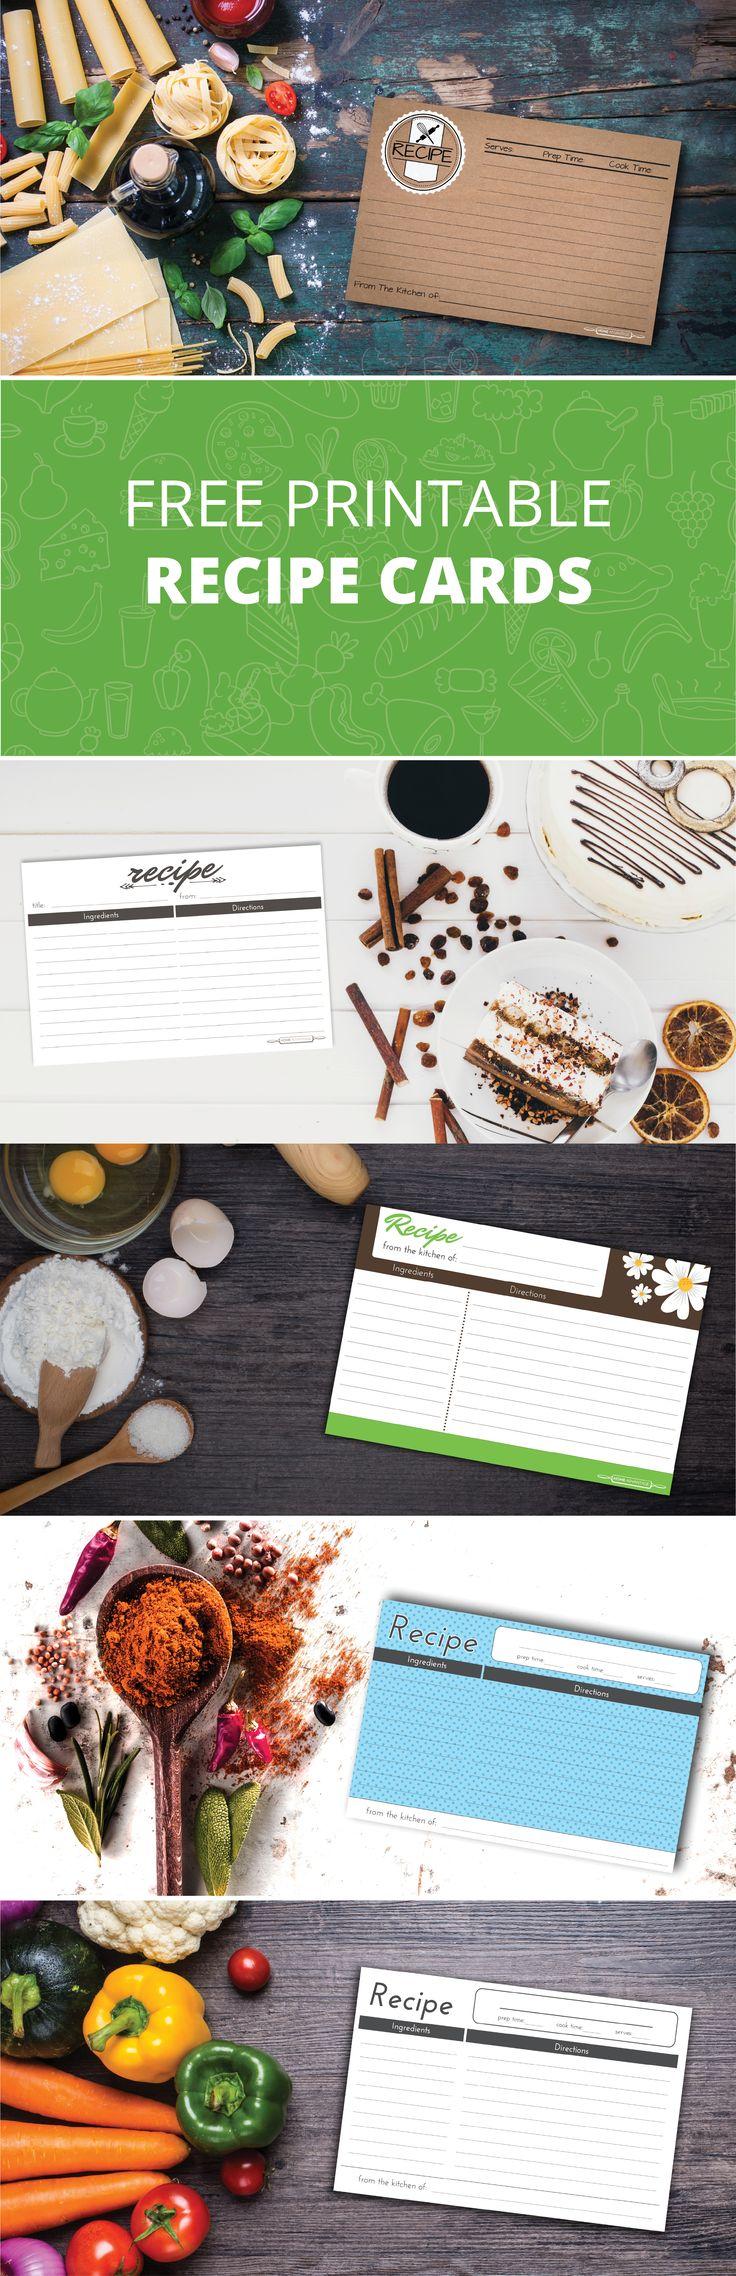 Free Printable Recipe Card Templates